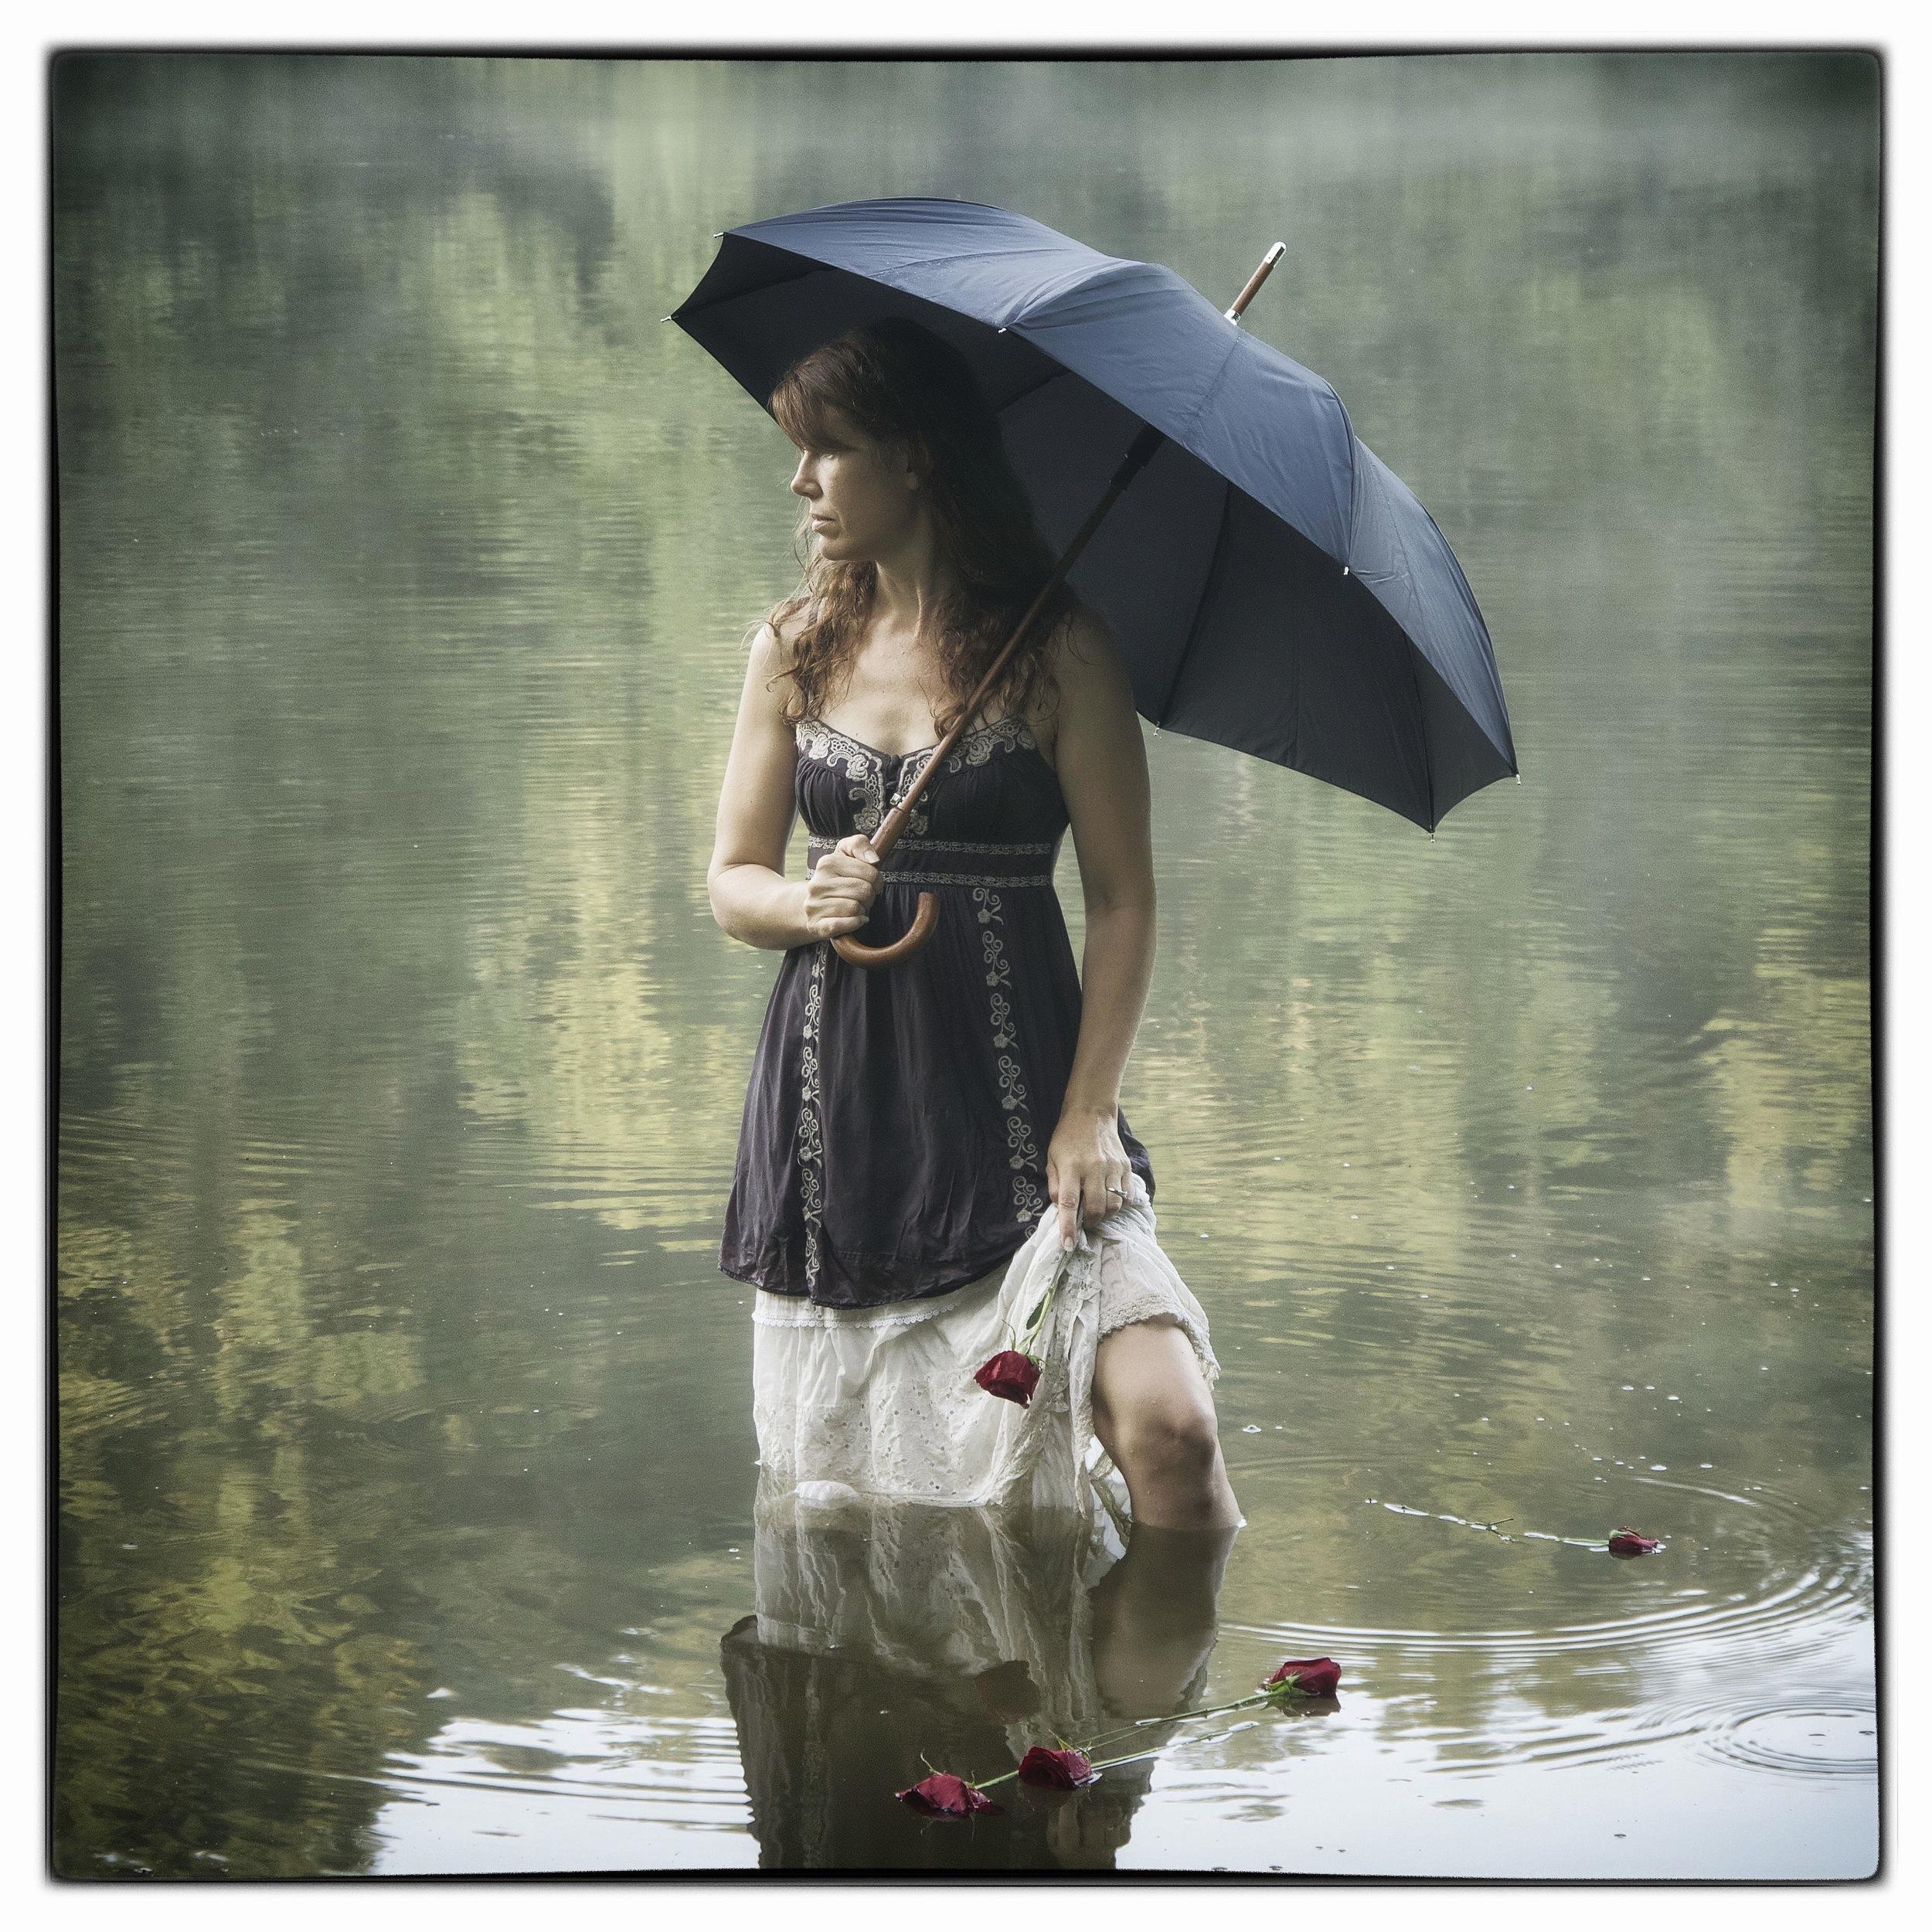 Lady with Black Umbrella